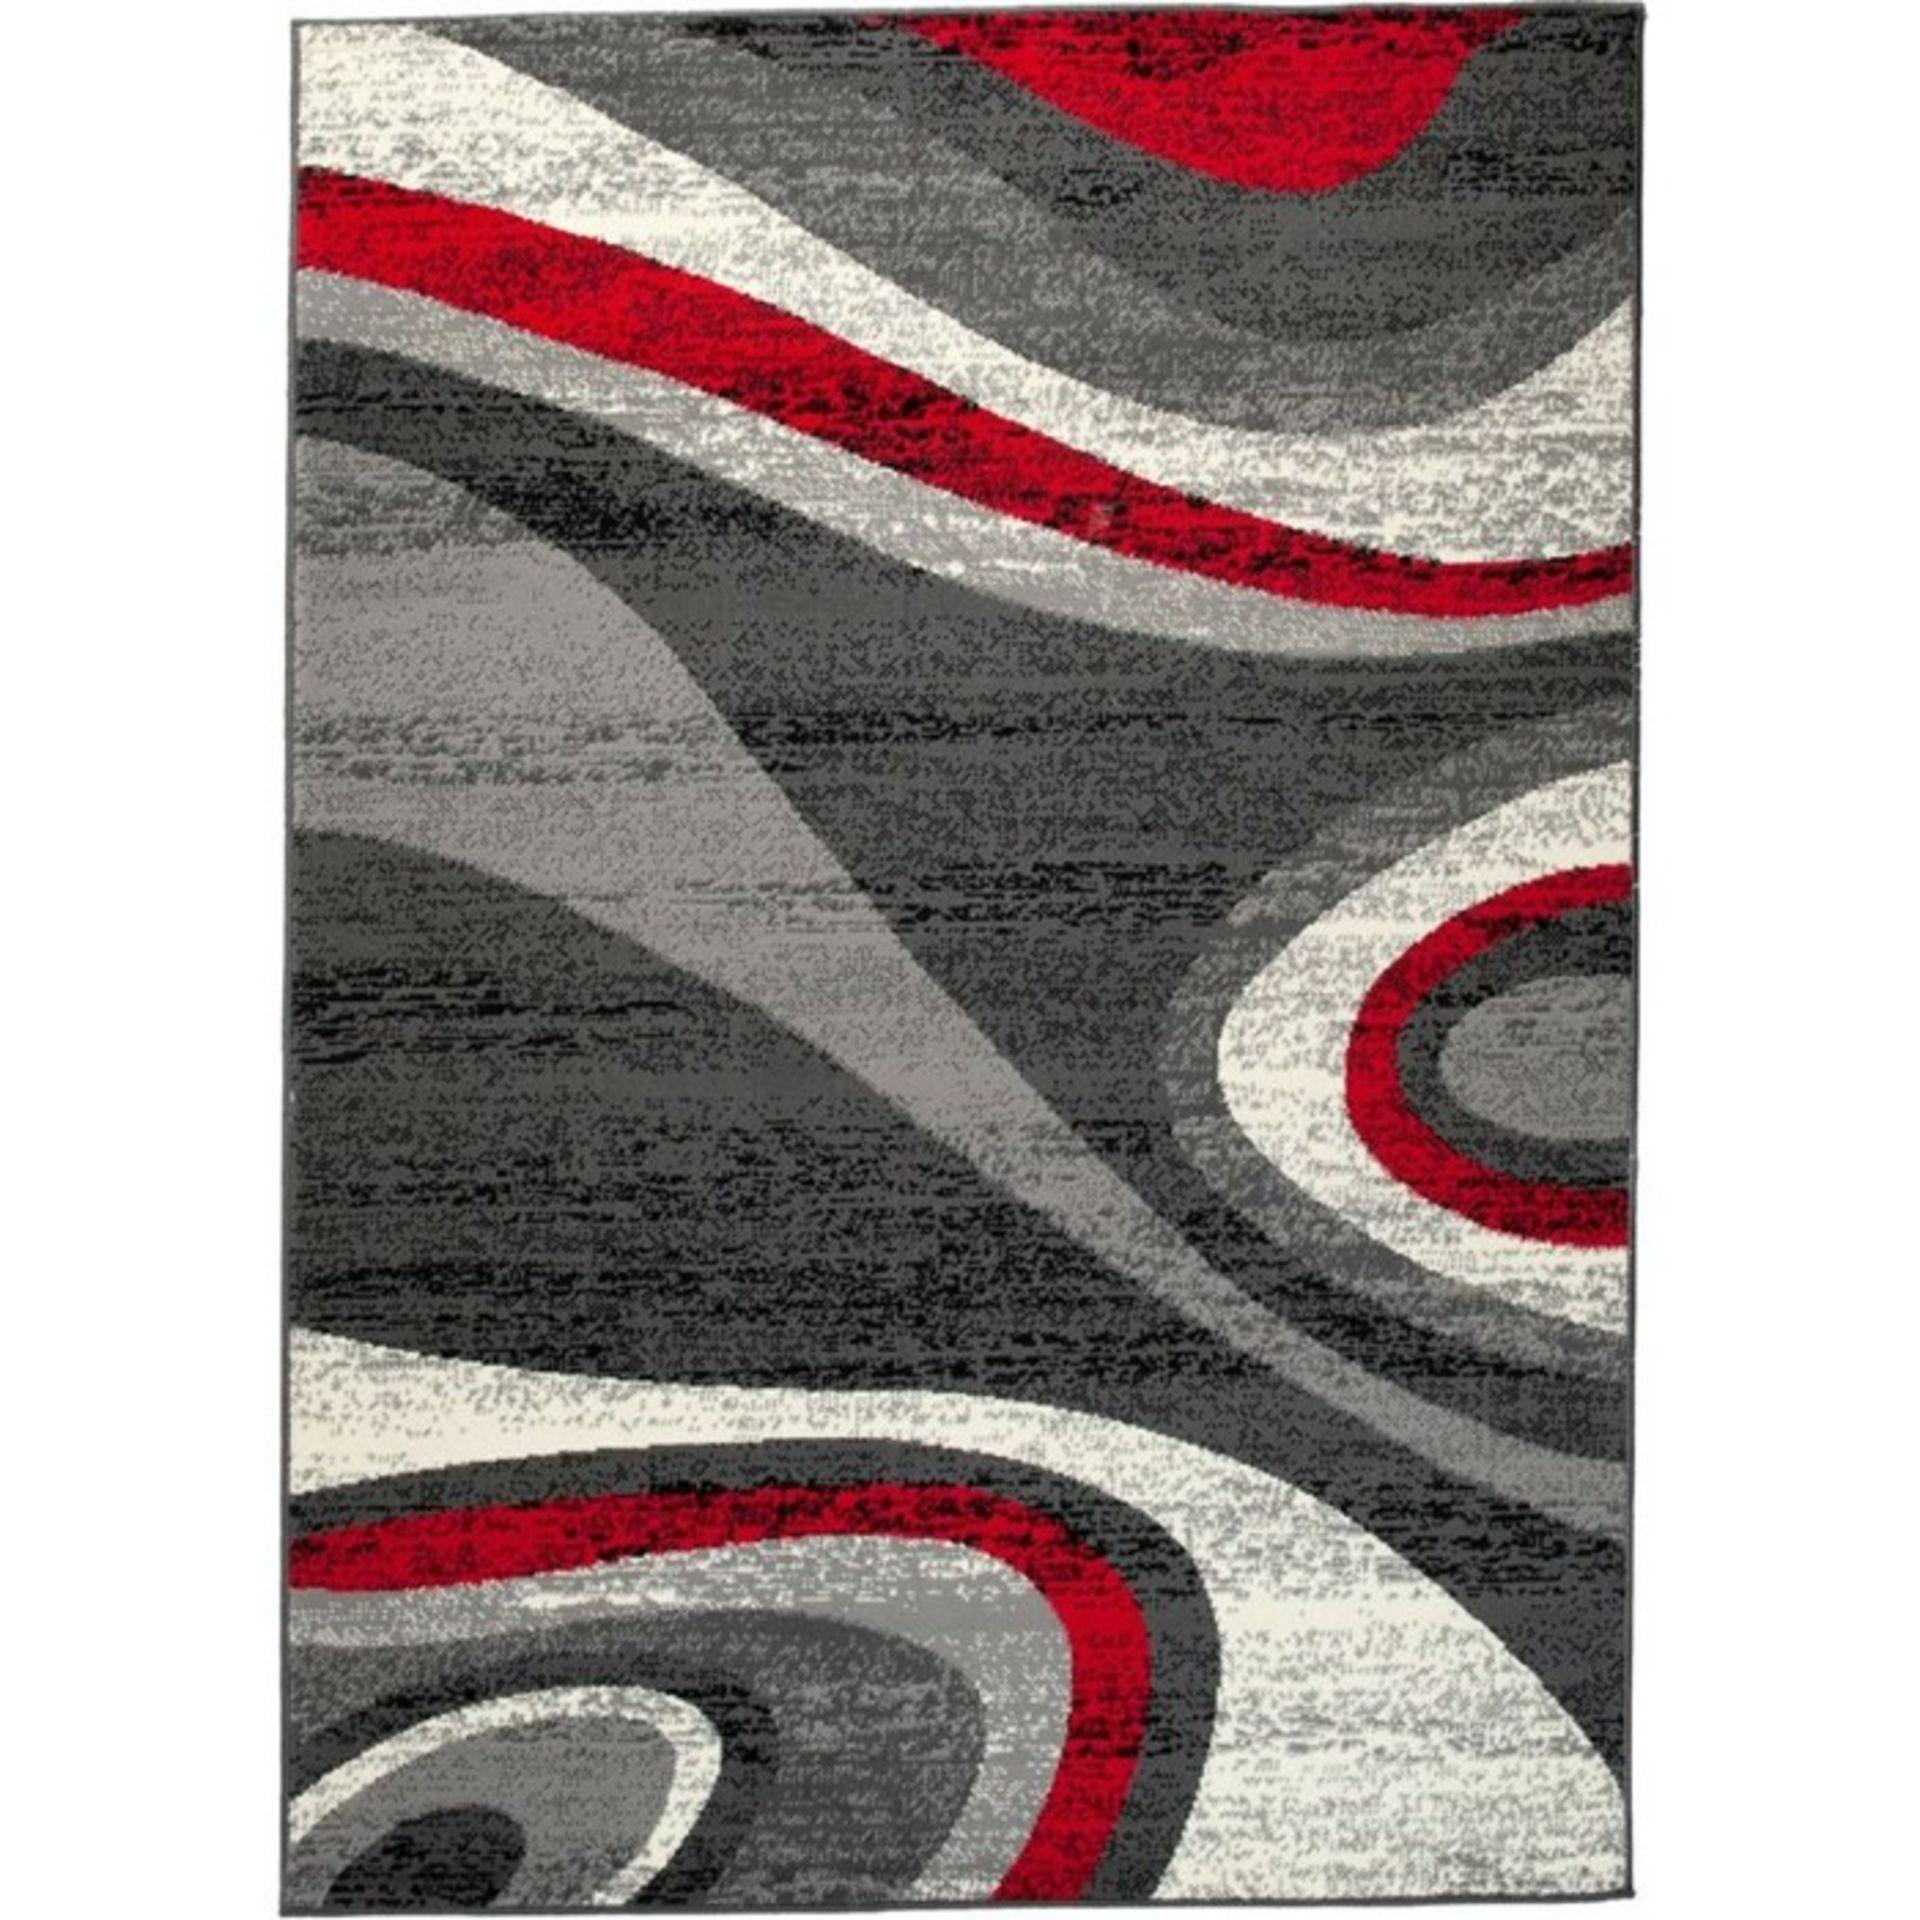 Longweave,Taurean Dark Grey Rug (80X150CM)RRP -£ 19.99(18267/36 -LOWV1655)